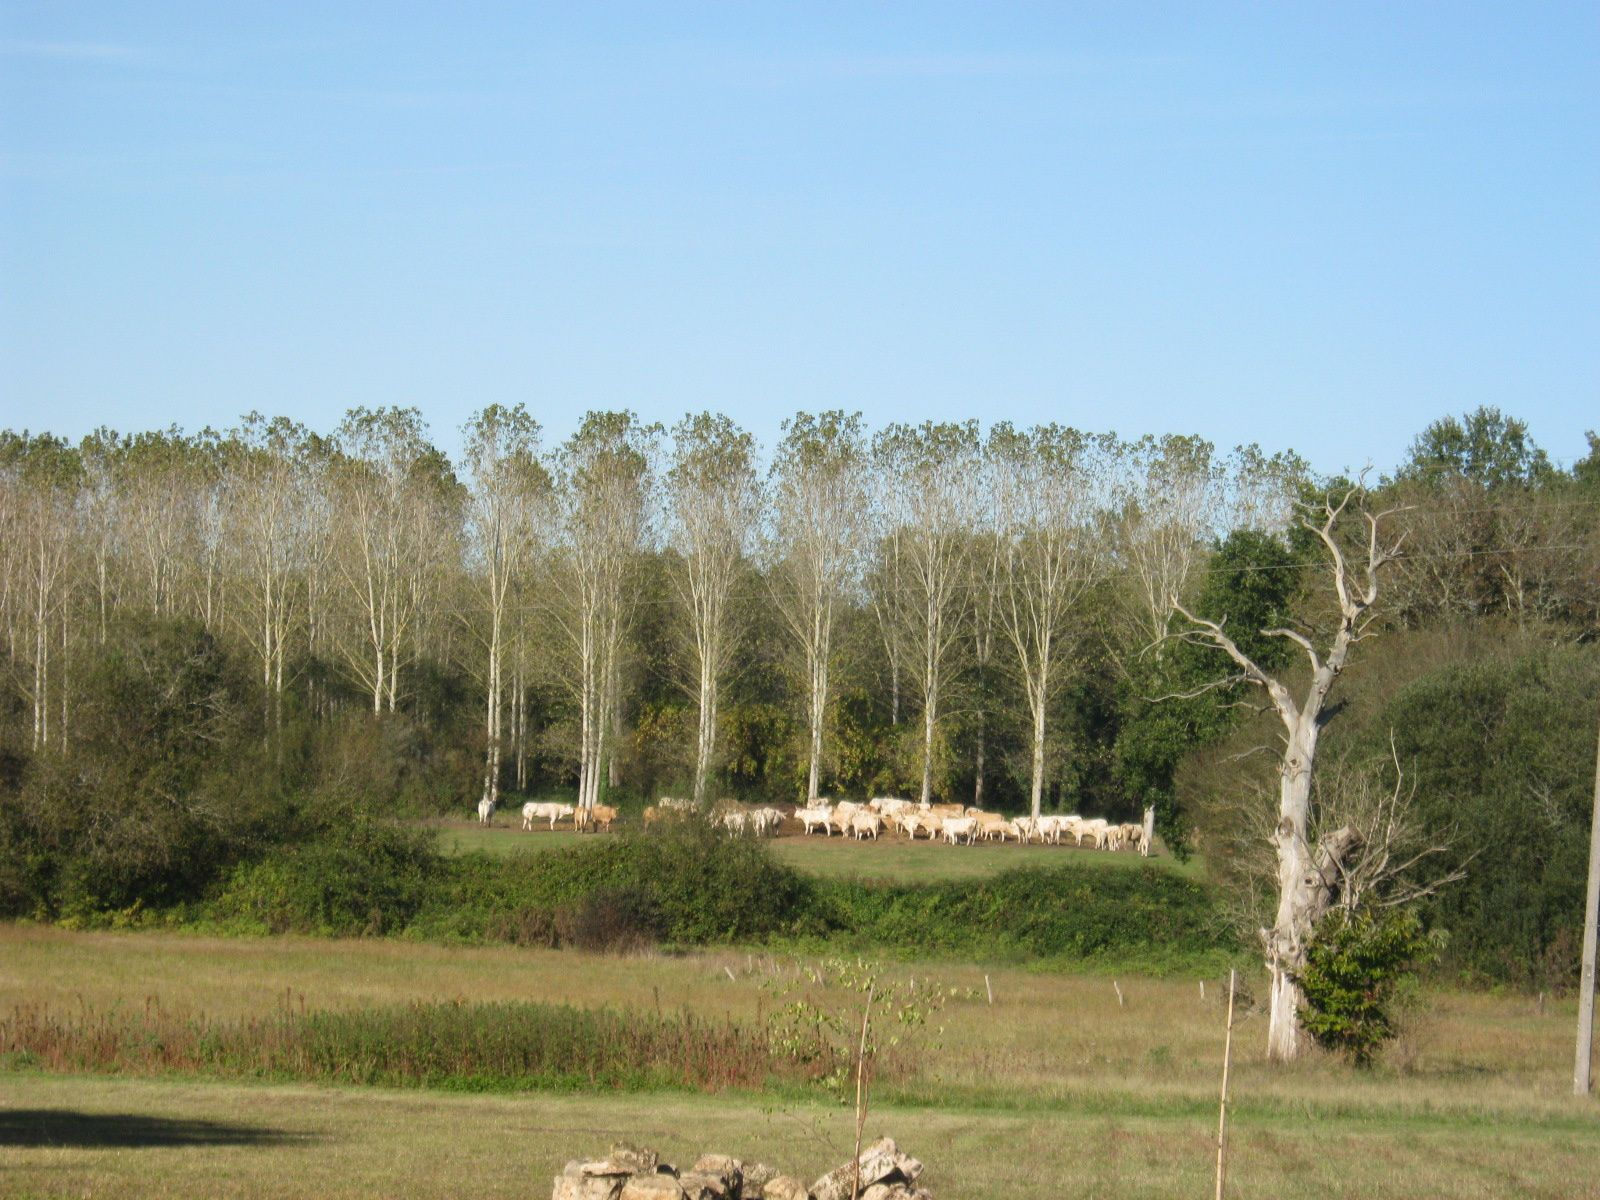 un beau troupeau au loin